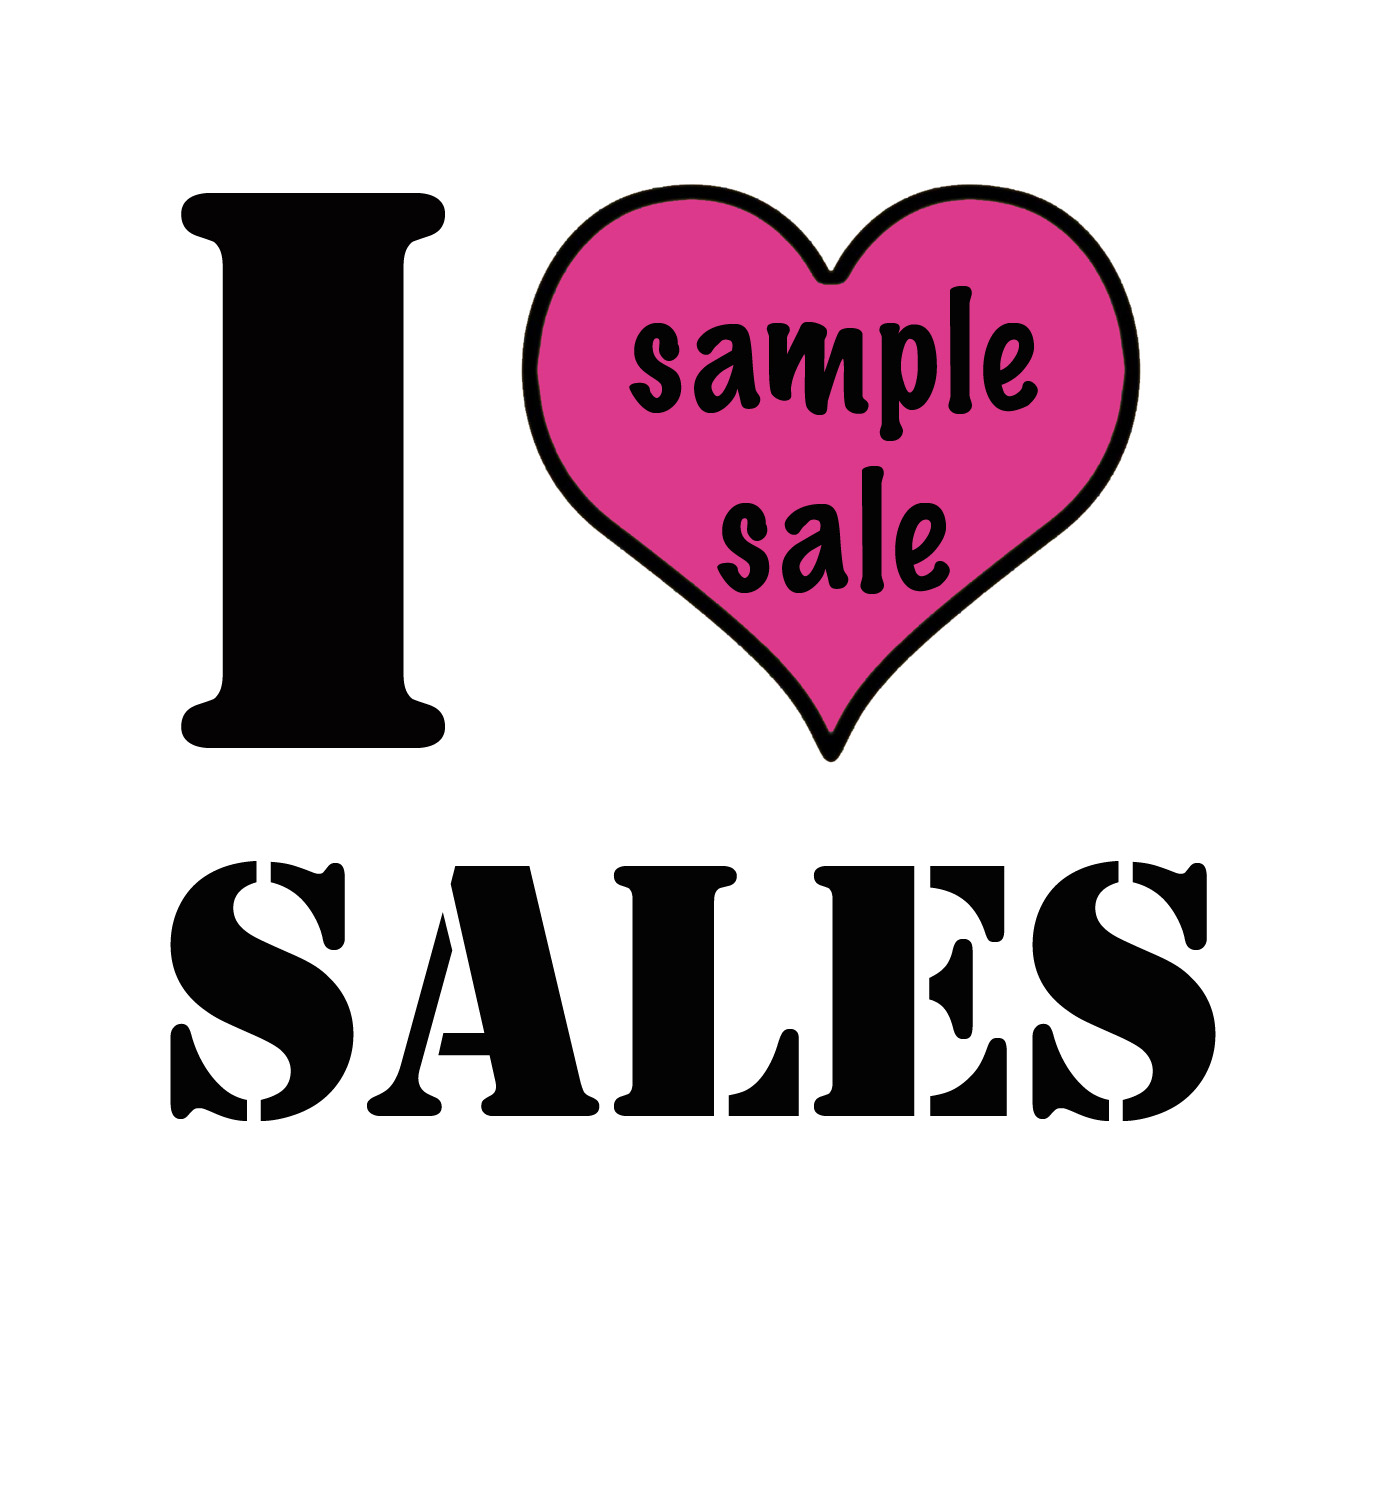 http://3.bp.blogspot.com/-XptHq9AxhU4/T3YgXNZ4VzI/AAAAAAAAWHU/z2BPHGv413I/s1600/sample-sale.jpg